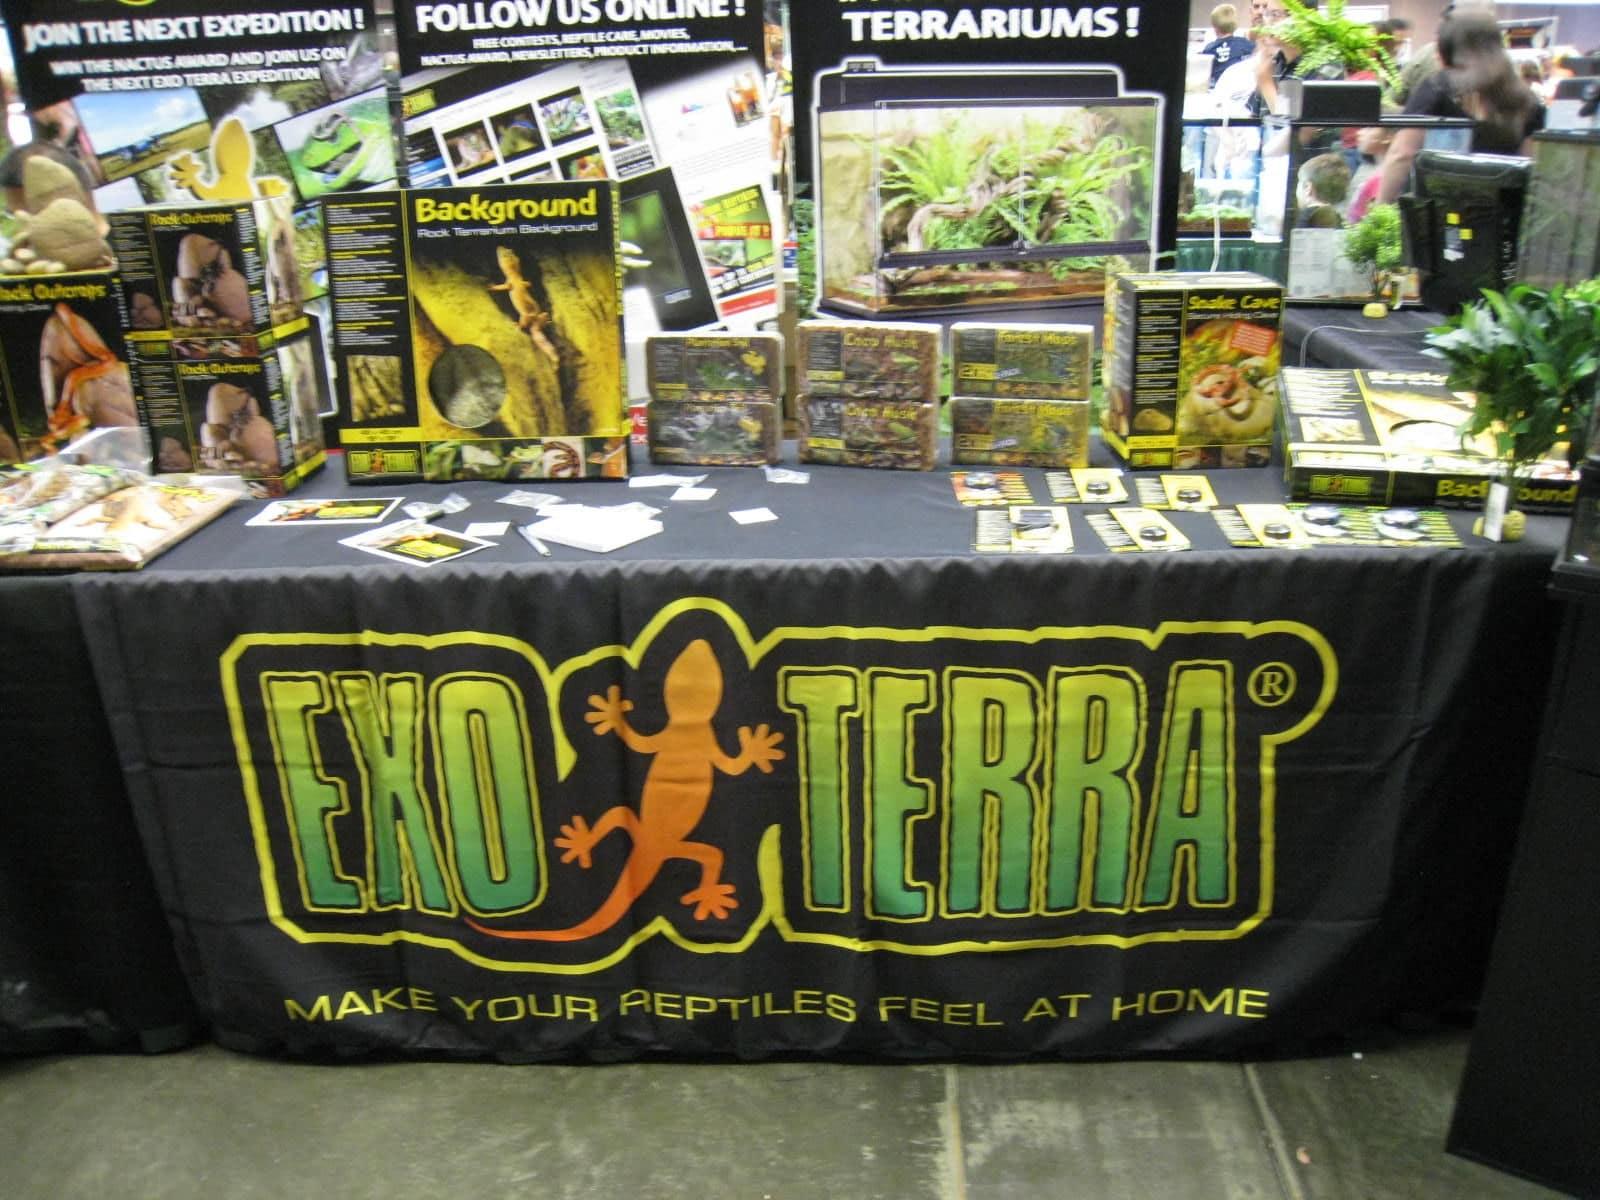 12th Annual Sacramento Reptile Show at the Convention Center